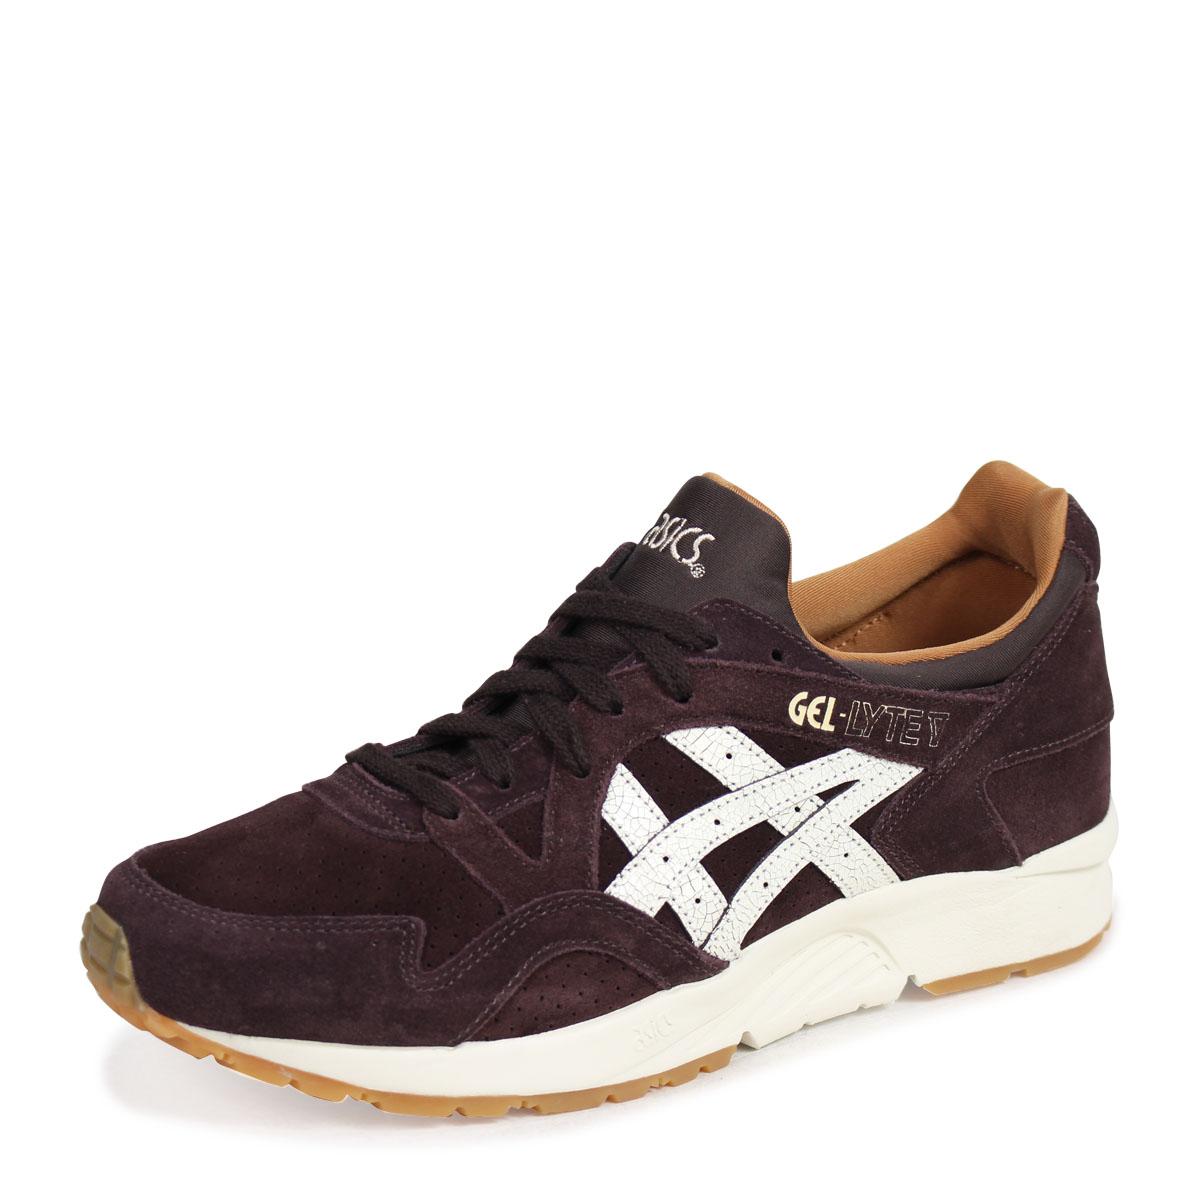 rozmiar 40 jakość wykonania kody kuponów asics Tiger GEL-LYTE V ASICS tiger gel light 5 sneakers H8E4L-2900 men  brown [load planned Shinnyu load in reservation product 3/20 containing]  [183]